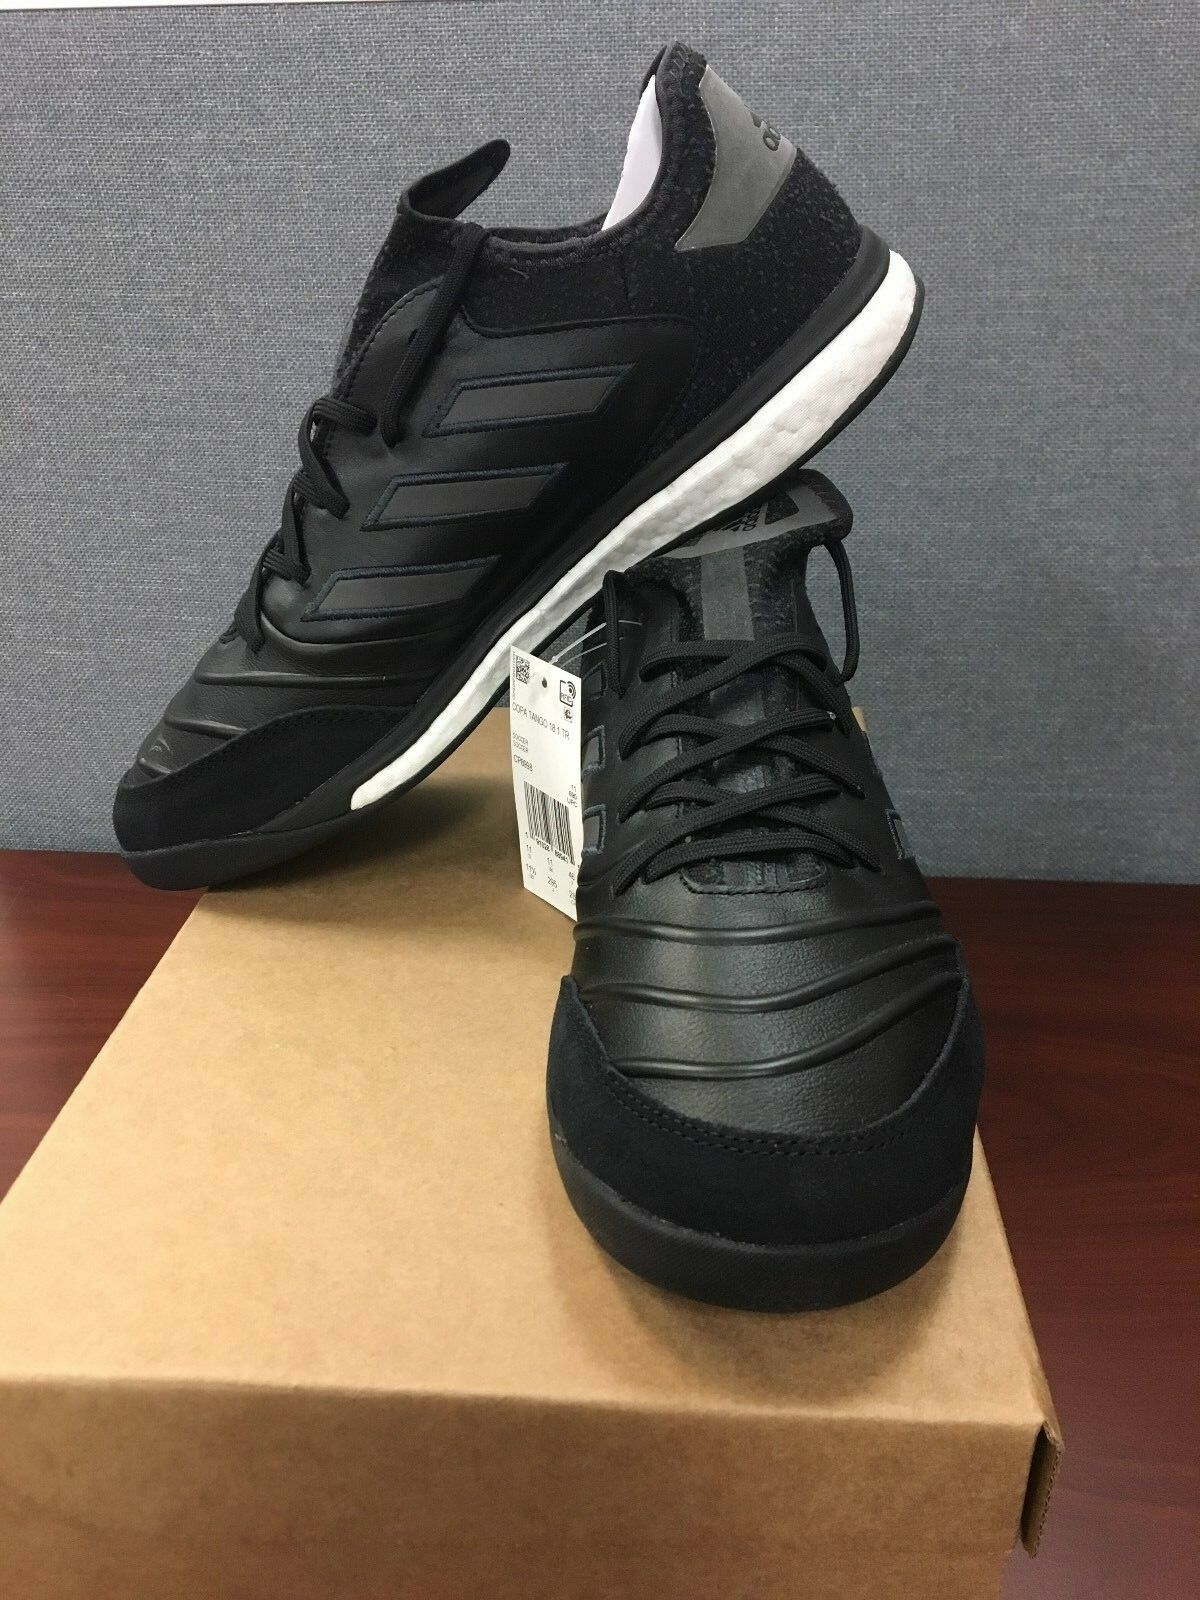 Adidas Copa Tango 18.1 shoes - Men's Soocer, SKU CP8998 Size 11.5